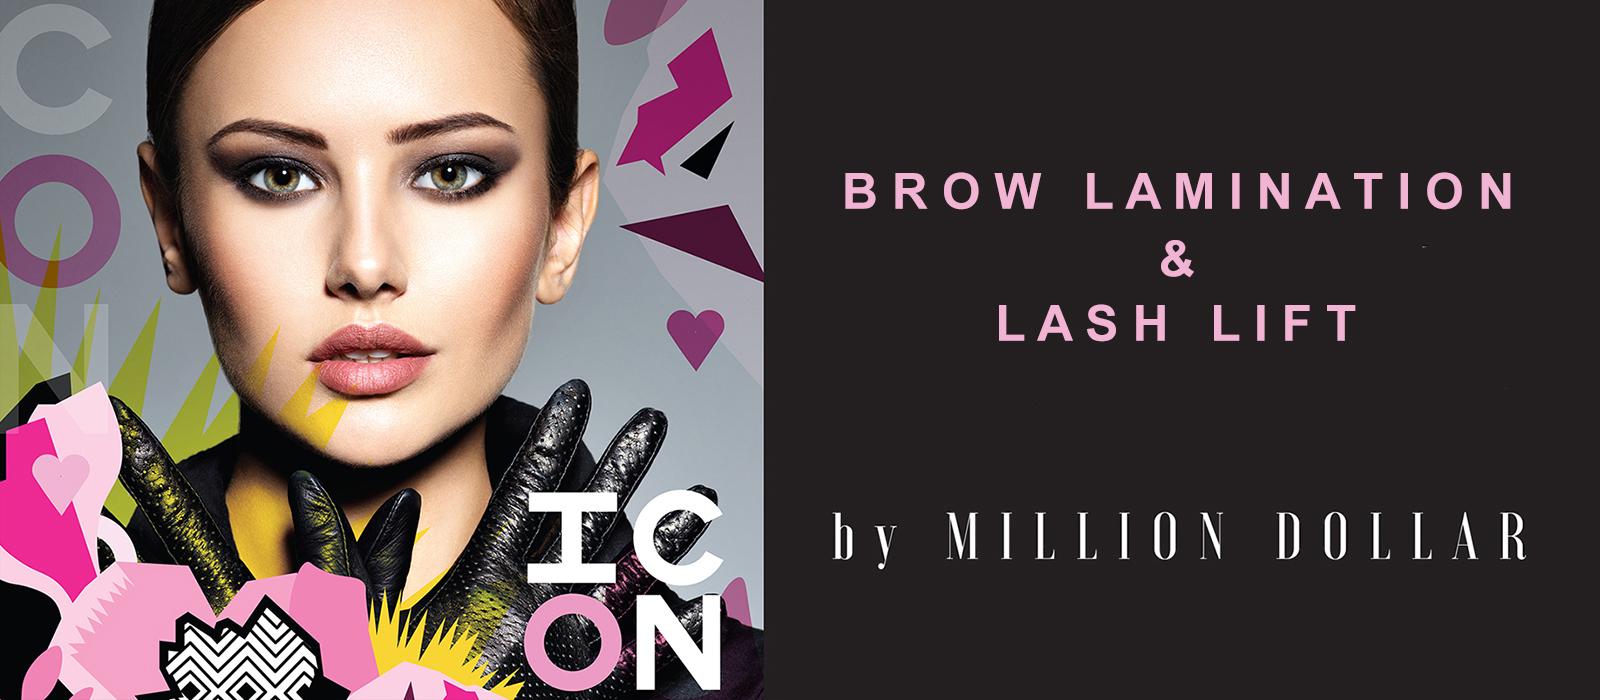 Brow Lamination & Lash Lift Course